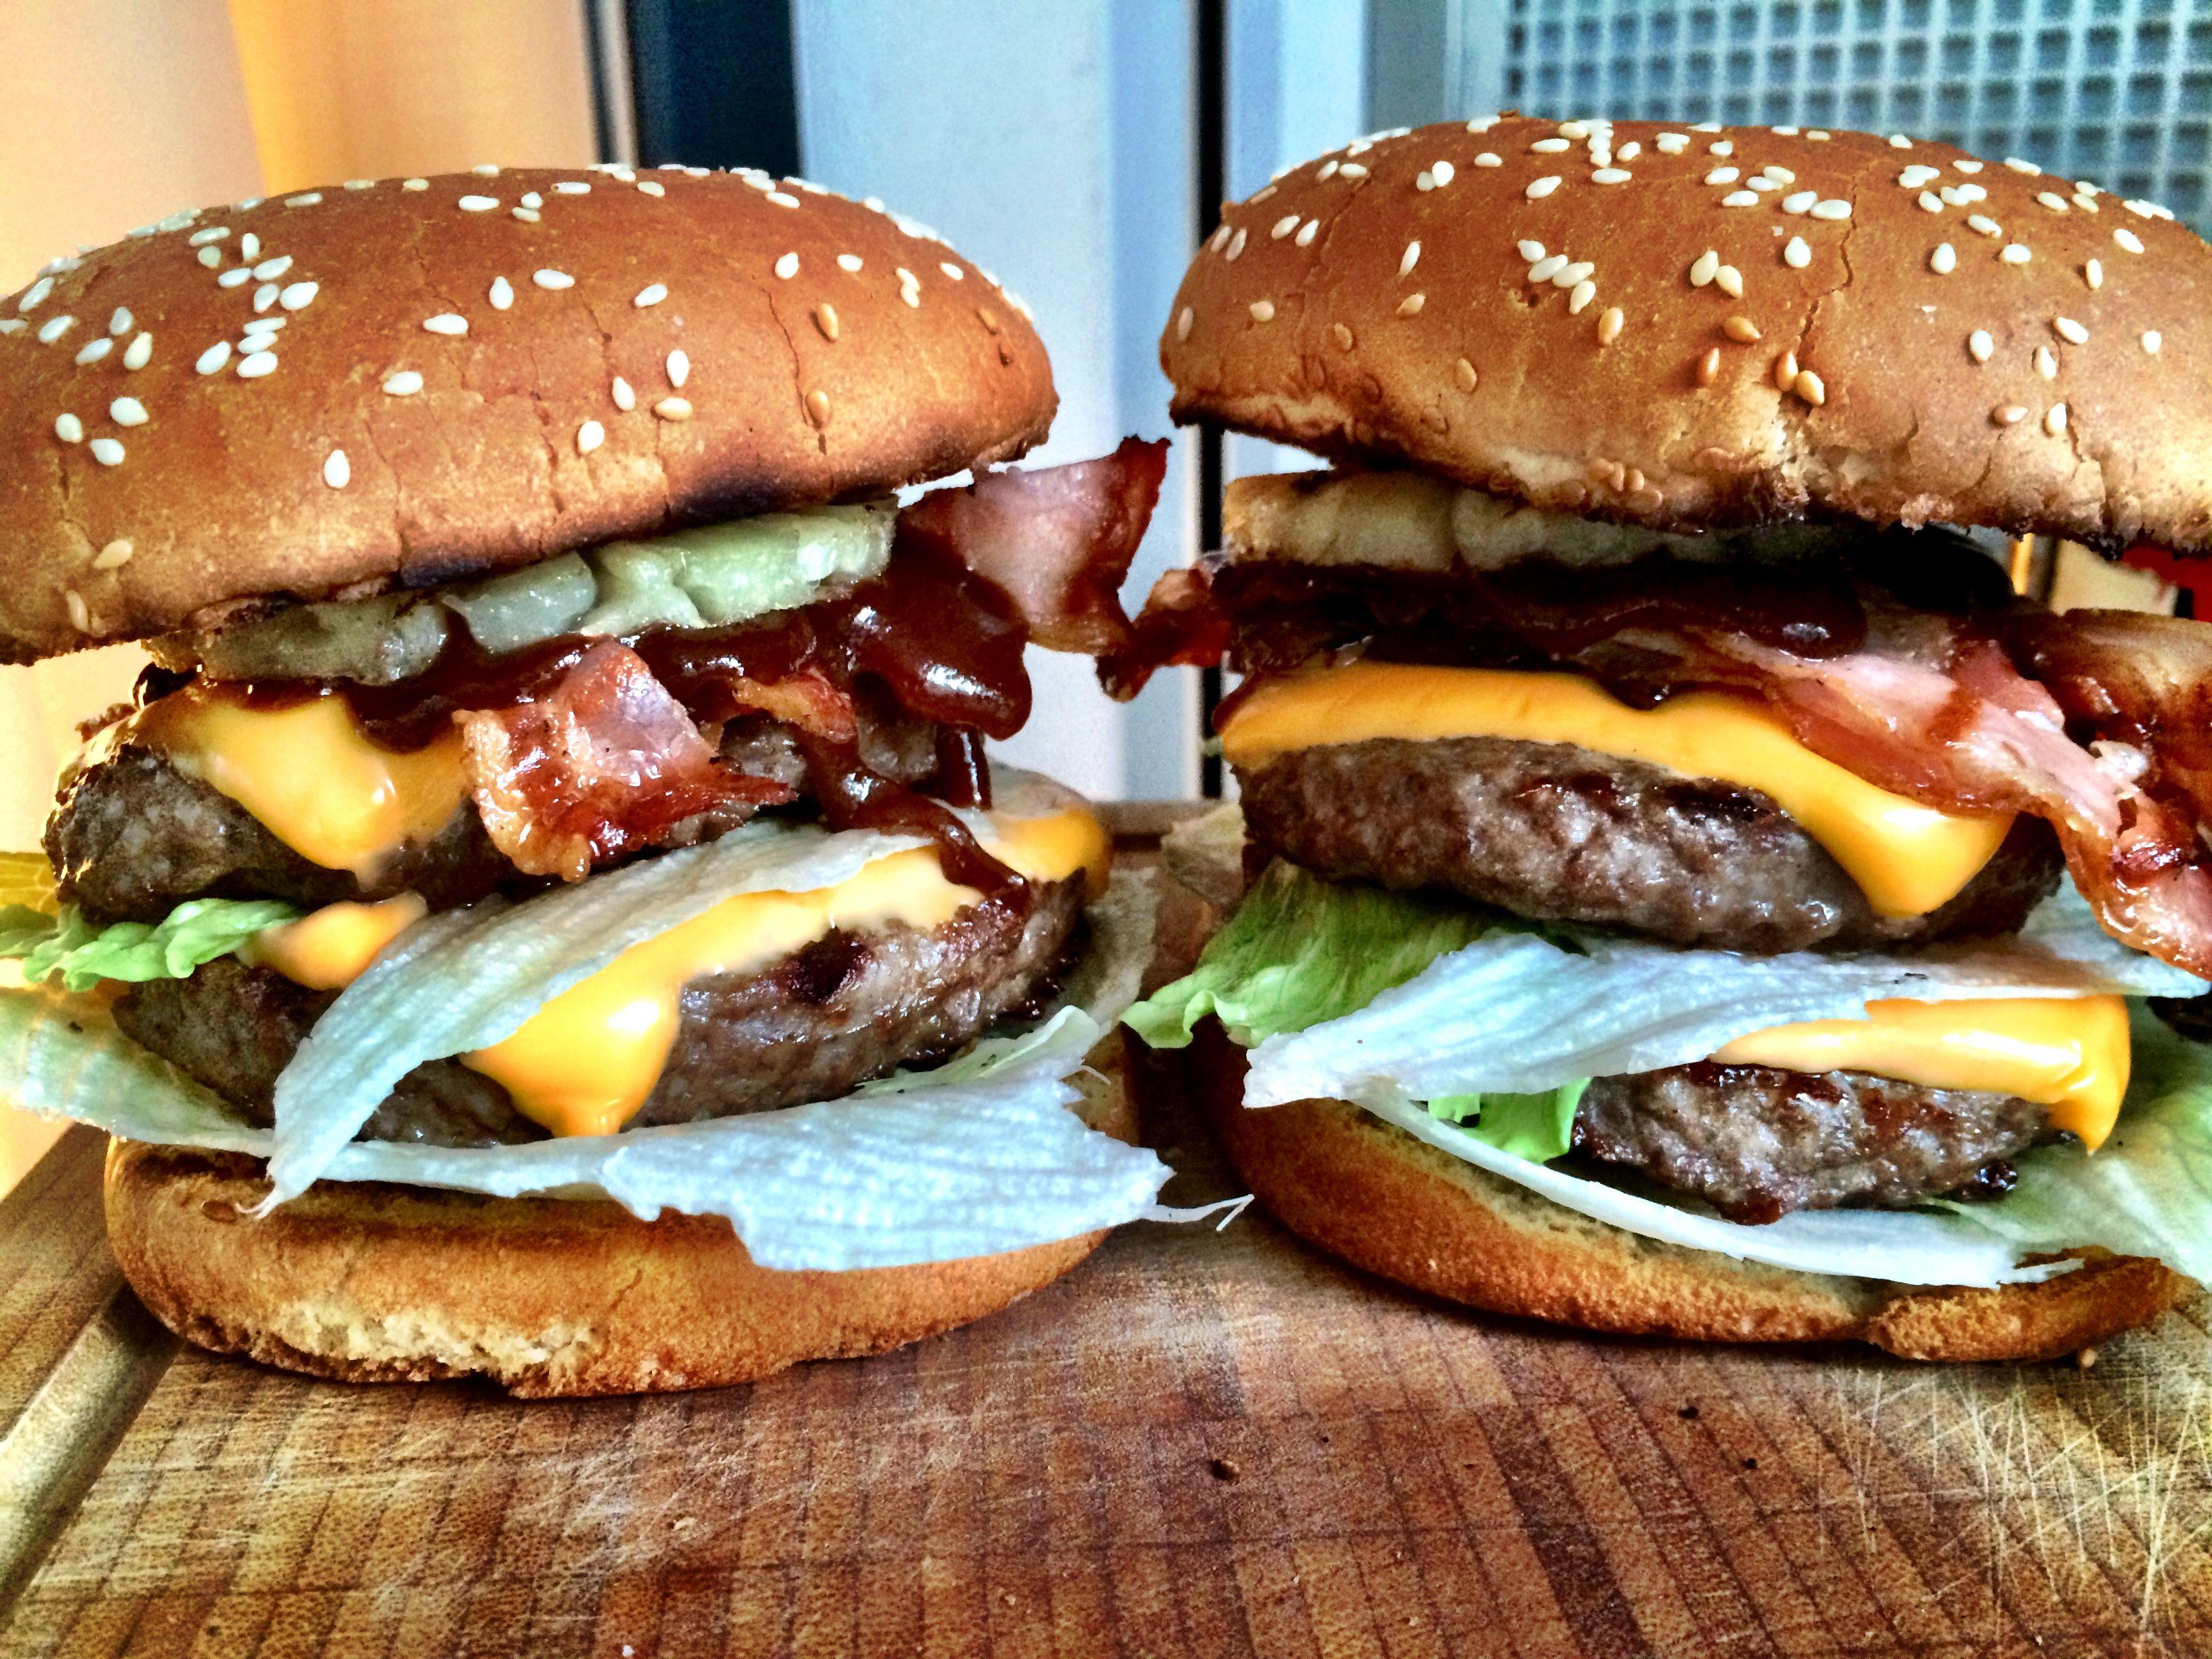 Big Kahuna Burger - Grillkameraden-Version | Burgers, Big and Big ...